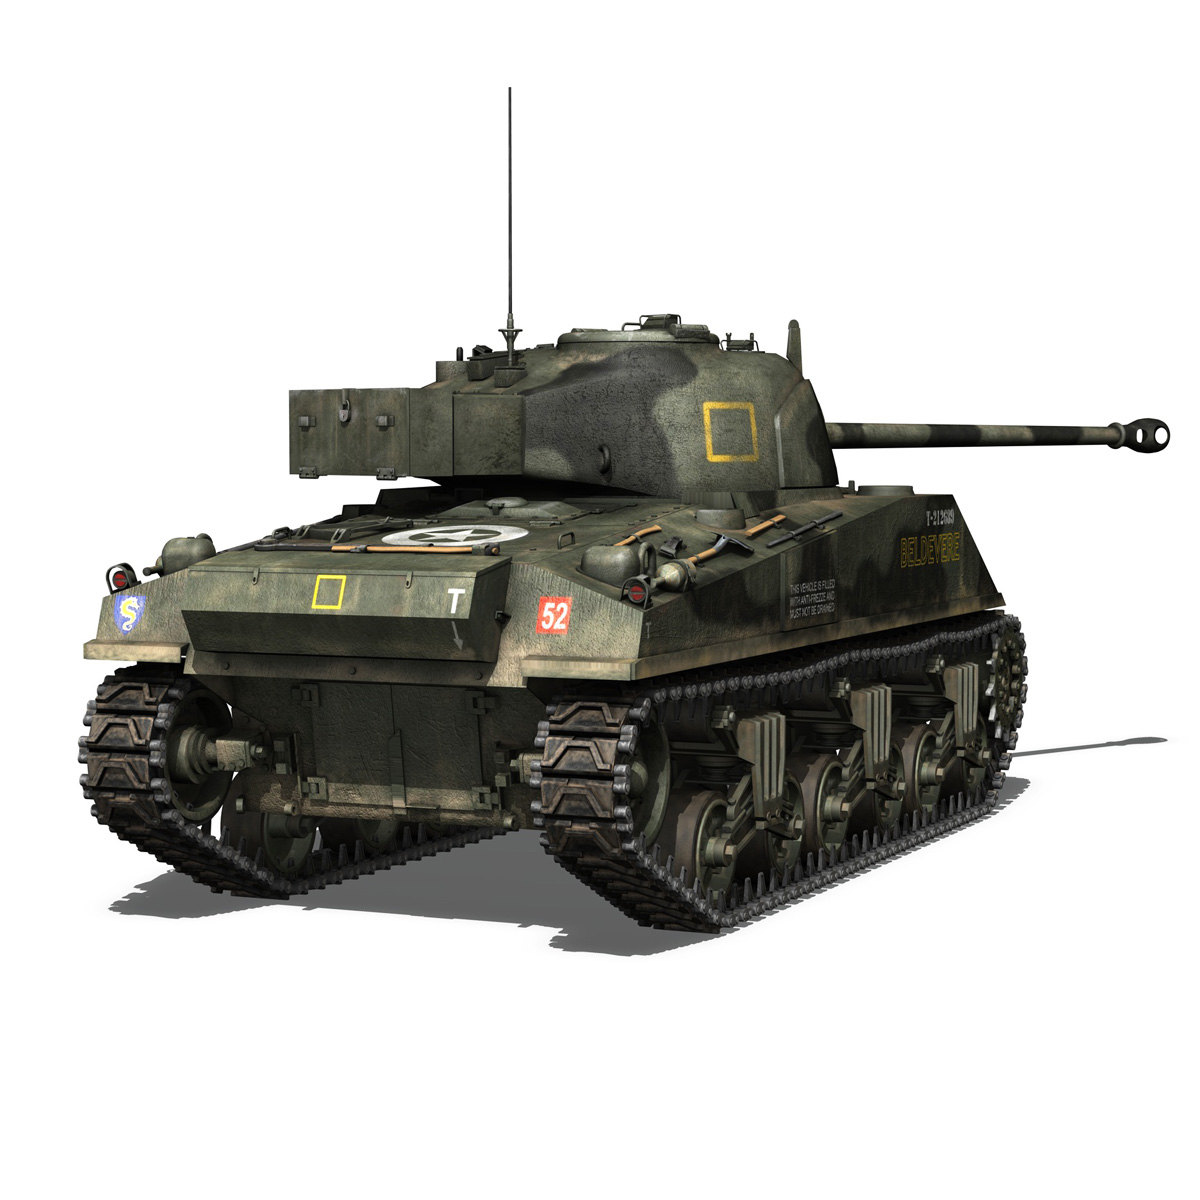 Sherman MK VC Firefly - Beldevere 3d model  266016